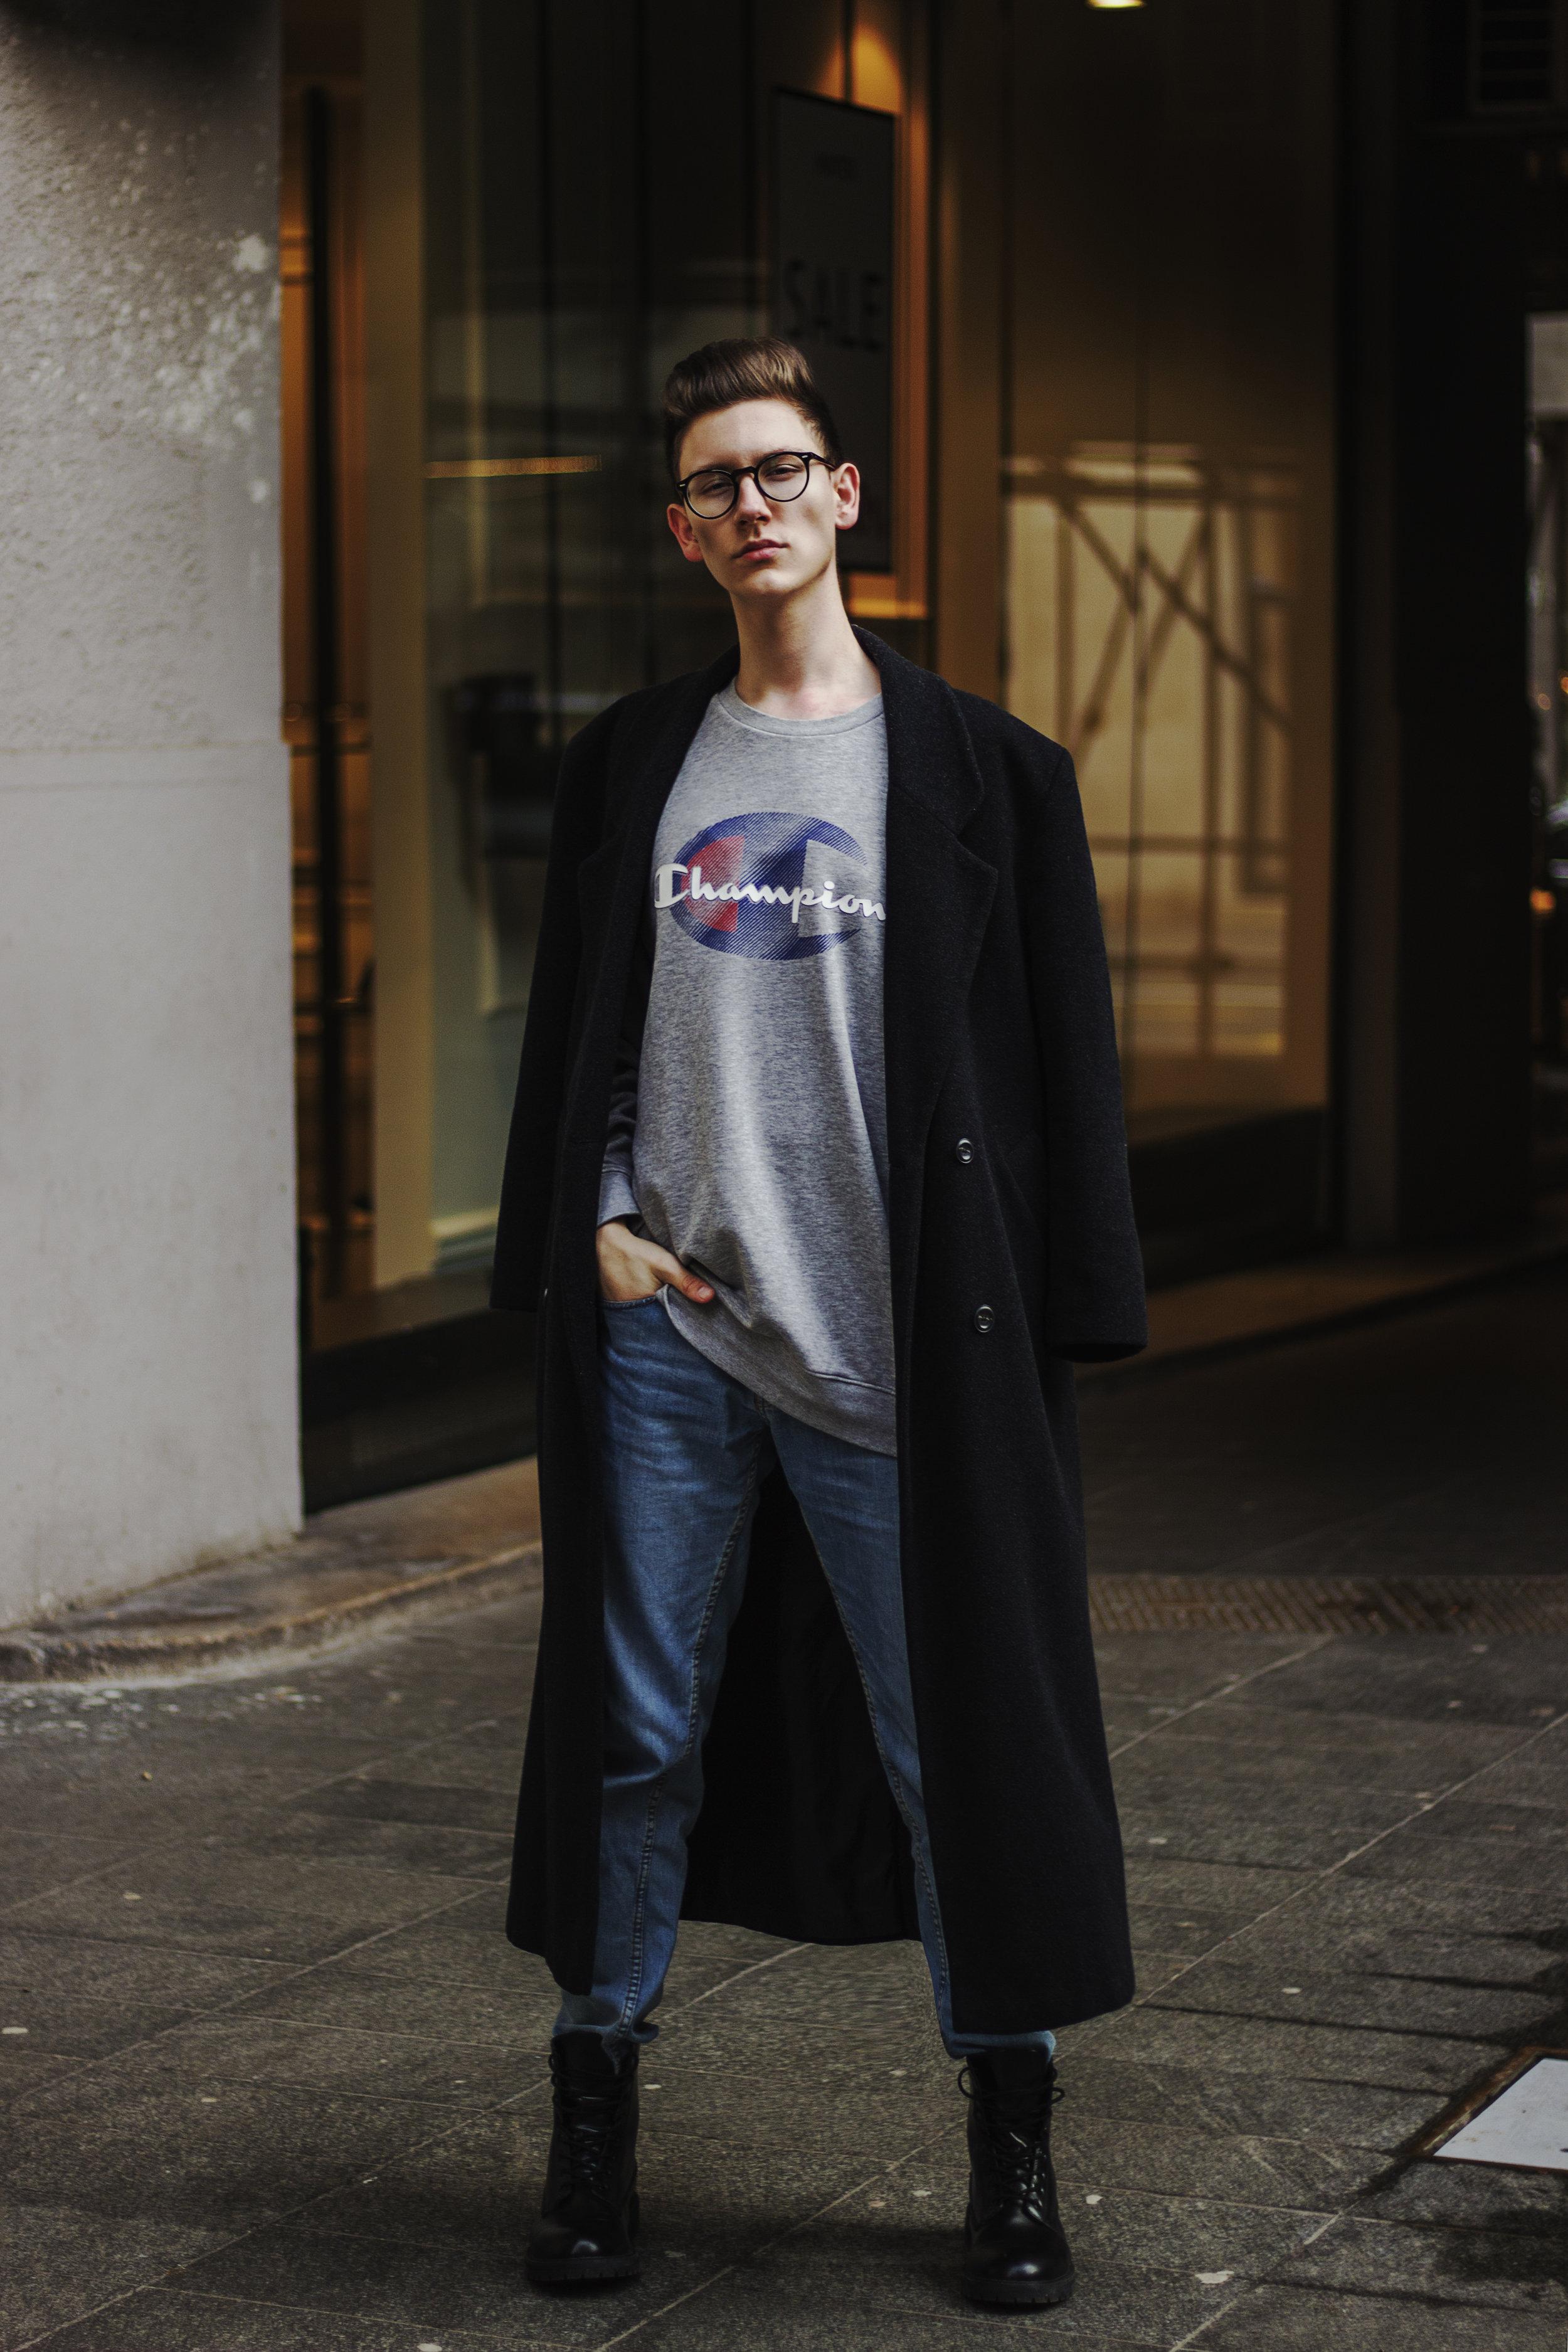 luka-lajic-expensive-reality-champion-hm-coat-boots-mens-fashion-croatia-blogger  (2).jpg